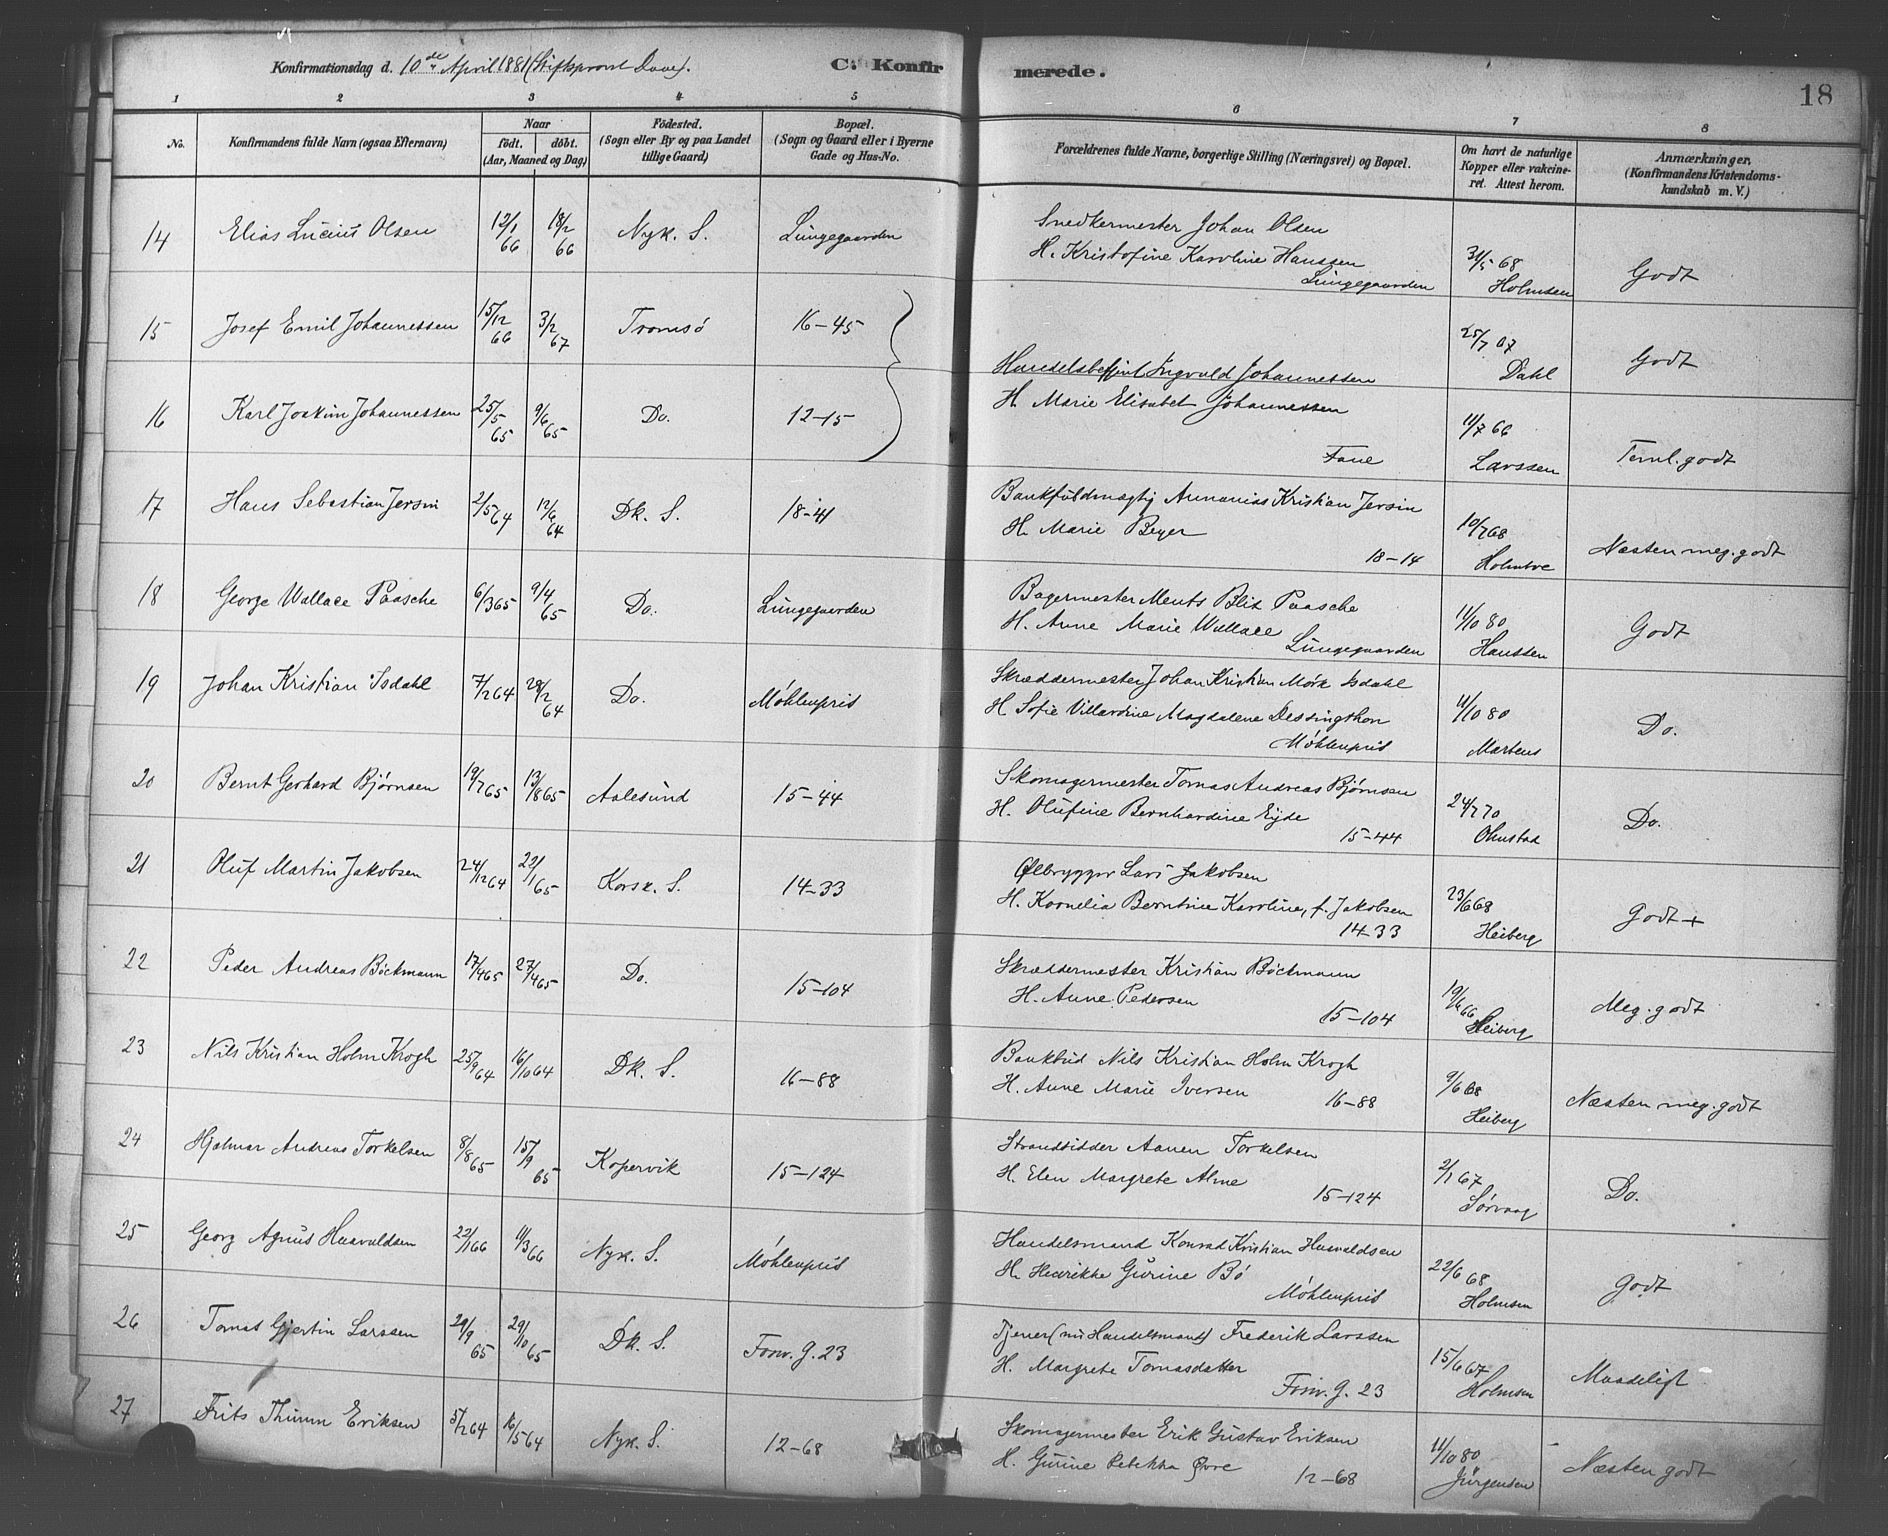 SAB, Domkirken Sokneprestembete, H/Haa/L0030: Ministerialbok nr. C 5, 1880-1898, s. 18